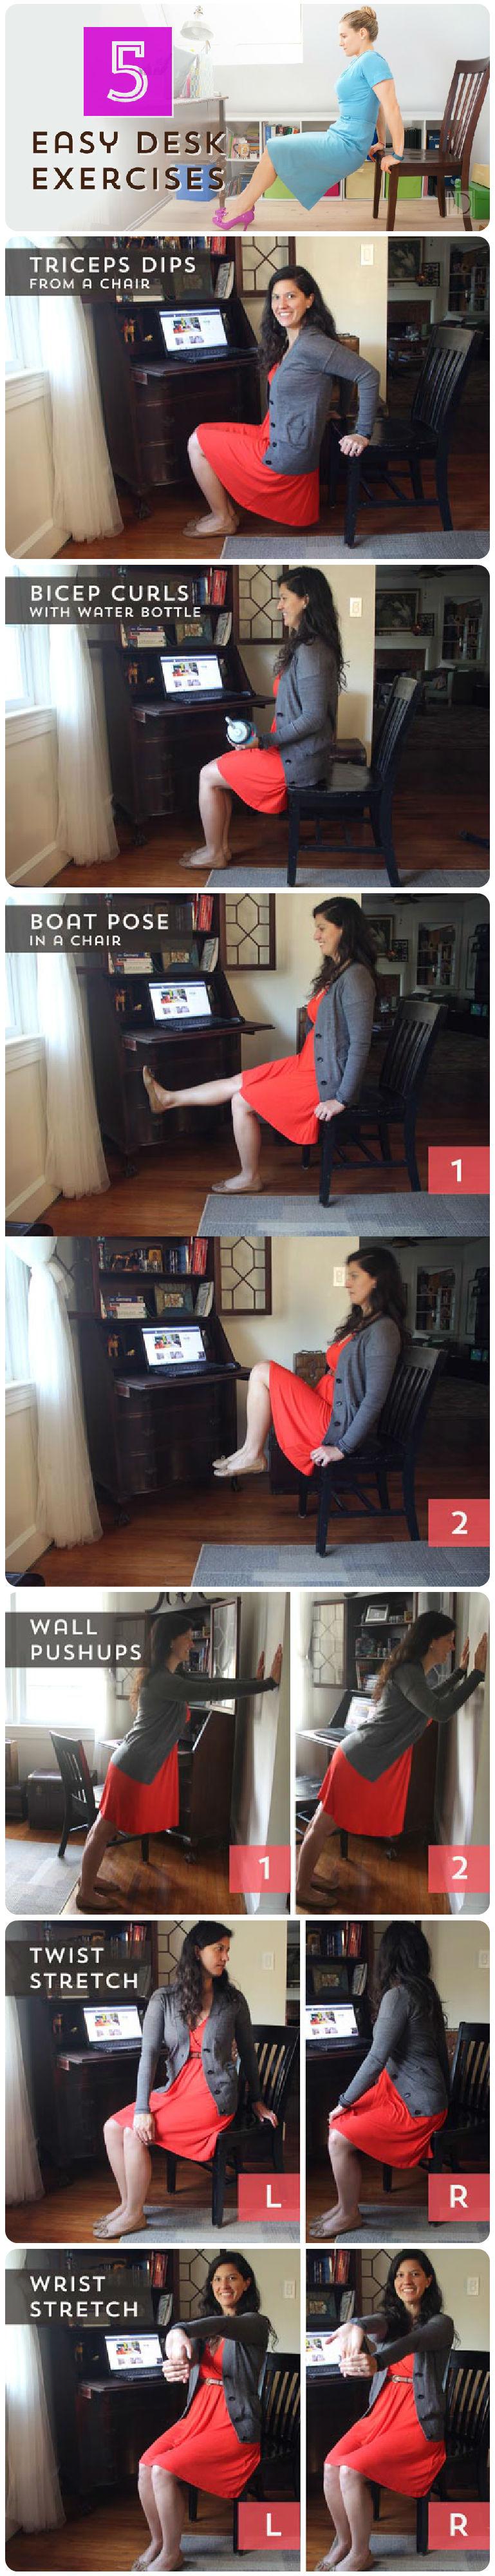 Five Easy Desk Exercises